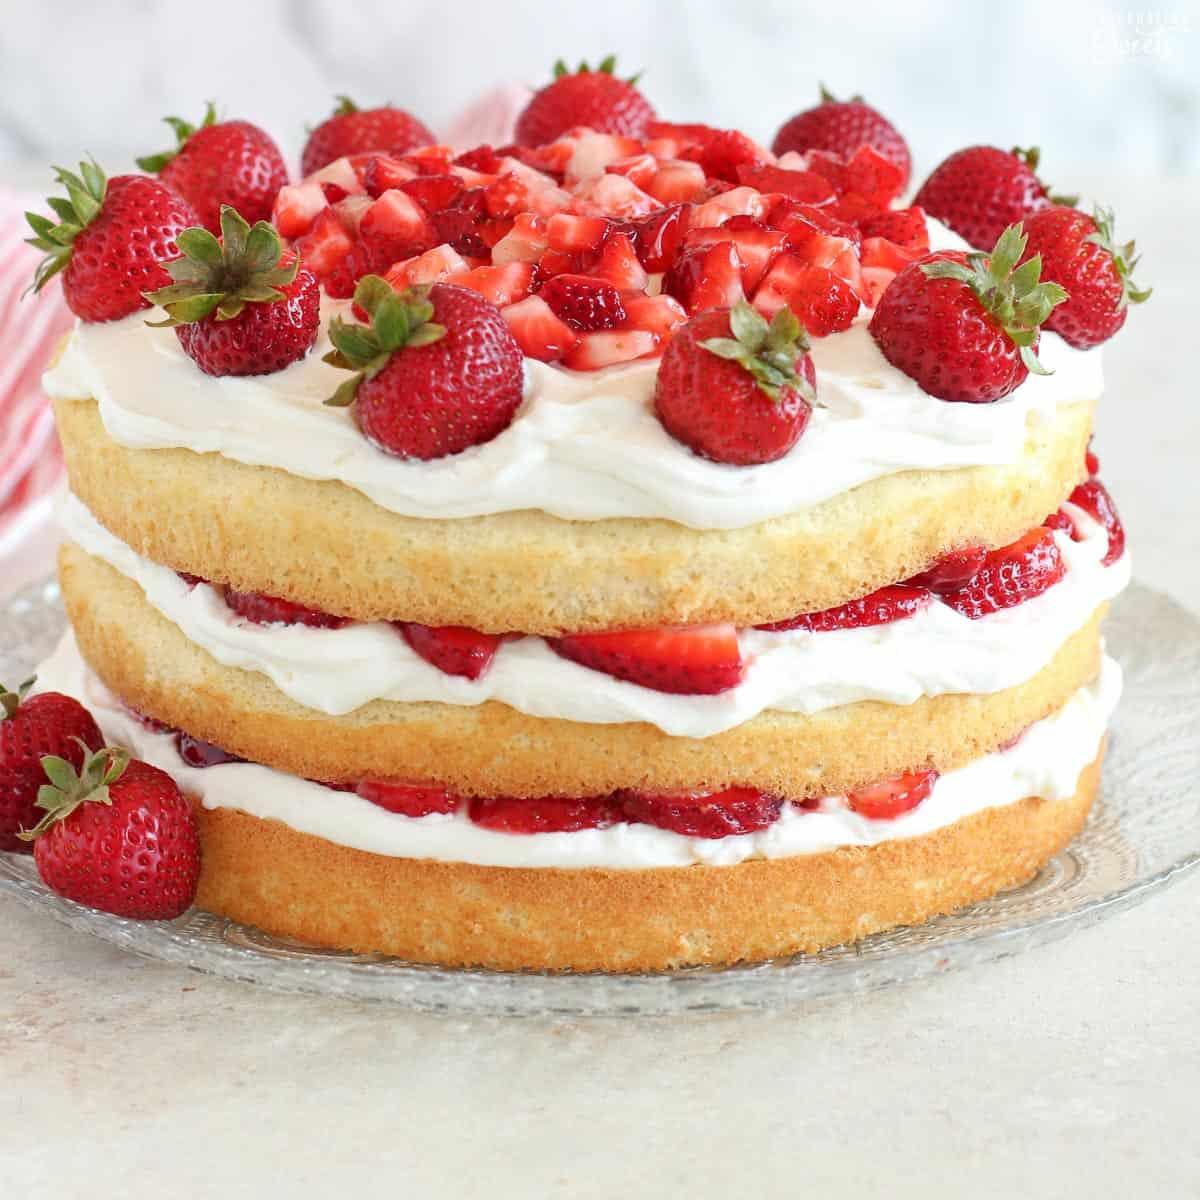 Strawberry-Shortcake-Cake-1-1